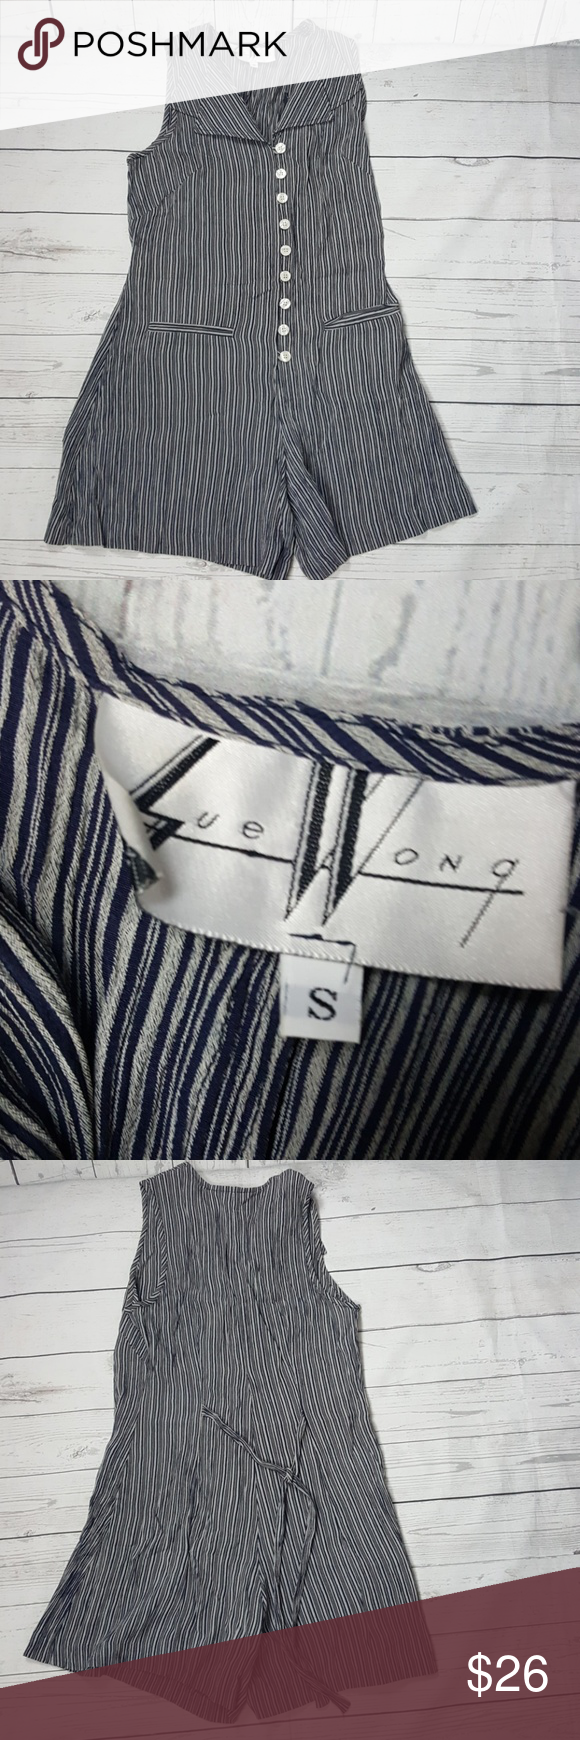 Sue Wong romper Sue wong rumper,button down, tie back, striped Sue Wong Shorts